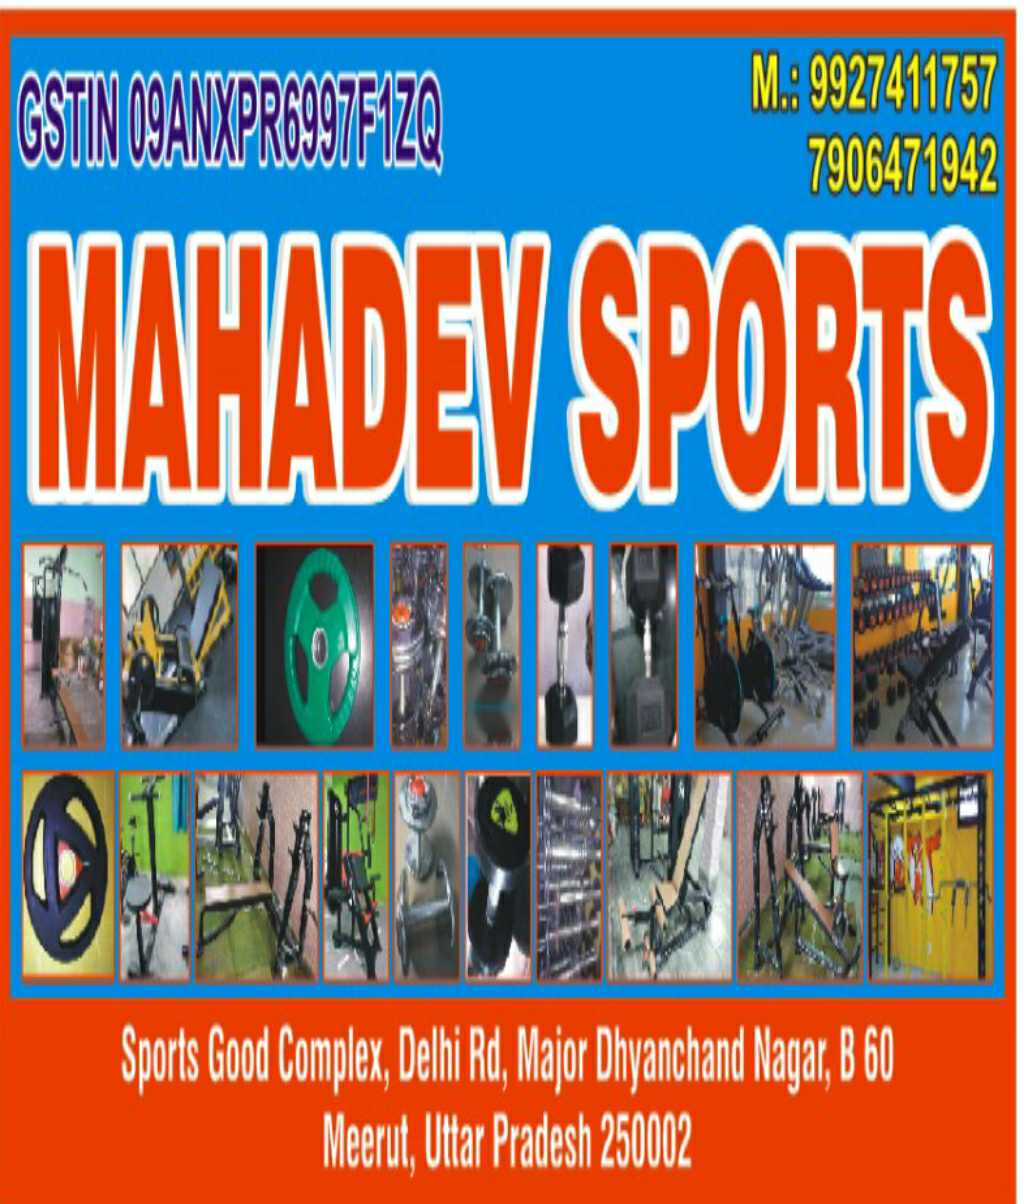 MAHADEV SPORTS